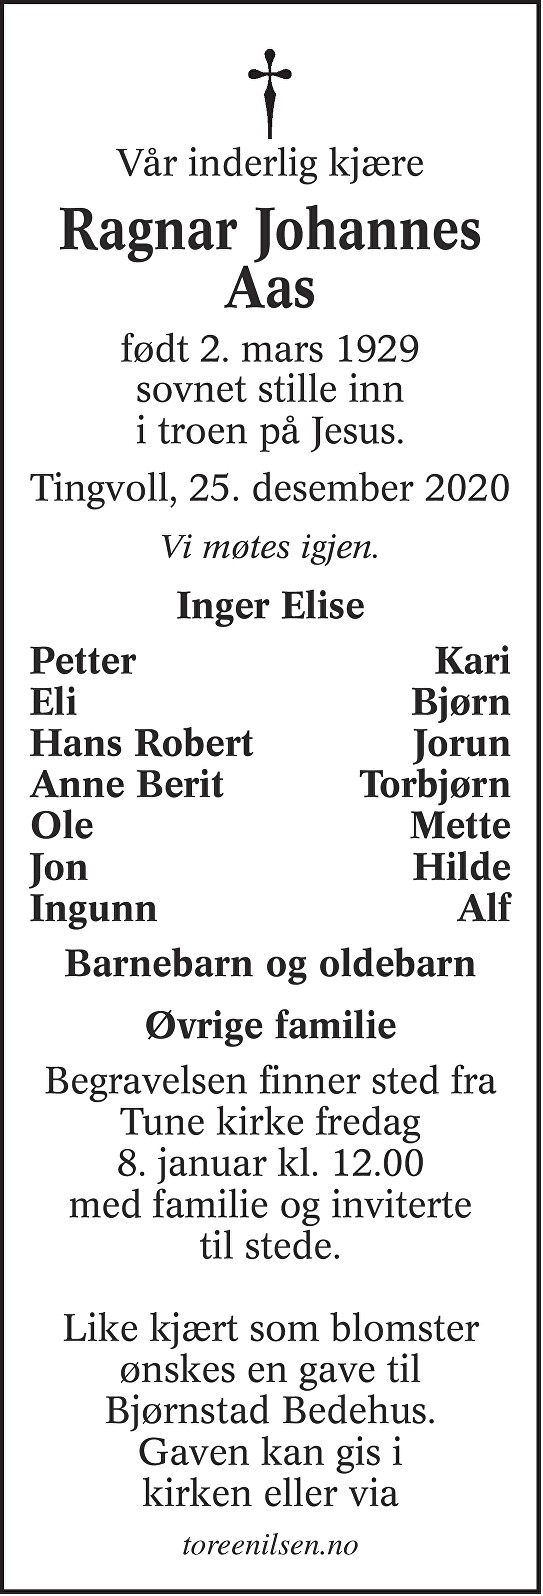 Ragnar Johannes Aas Dødsannonse